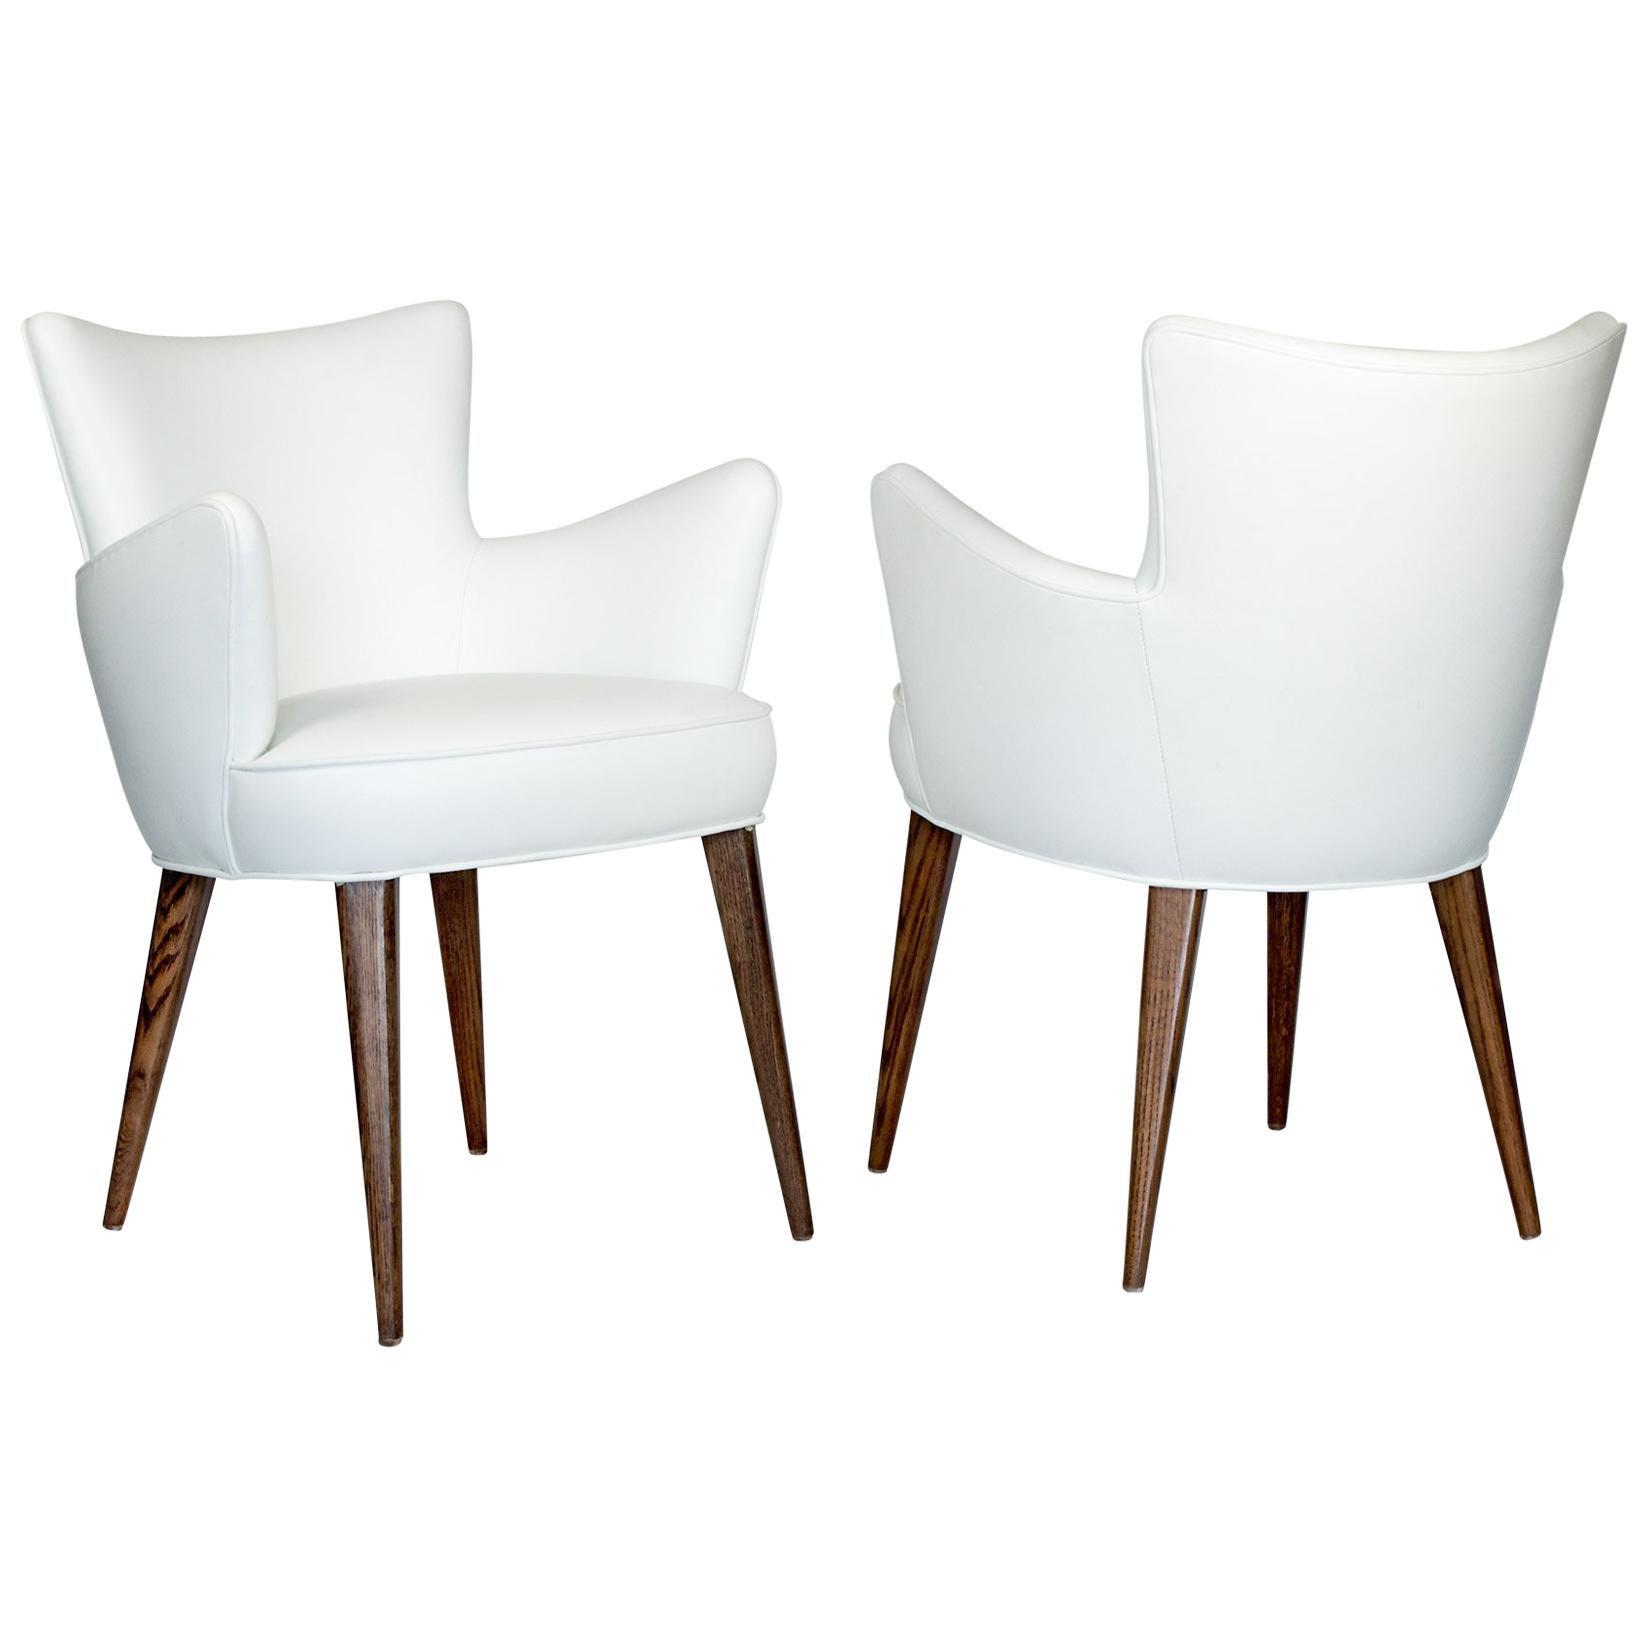 Aube Chair by Bourgeois Boheme Atelier